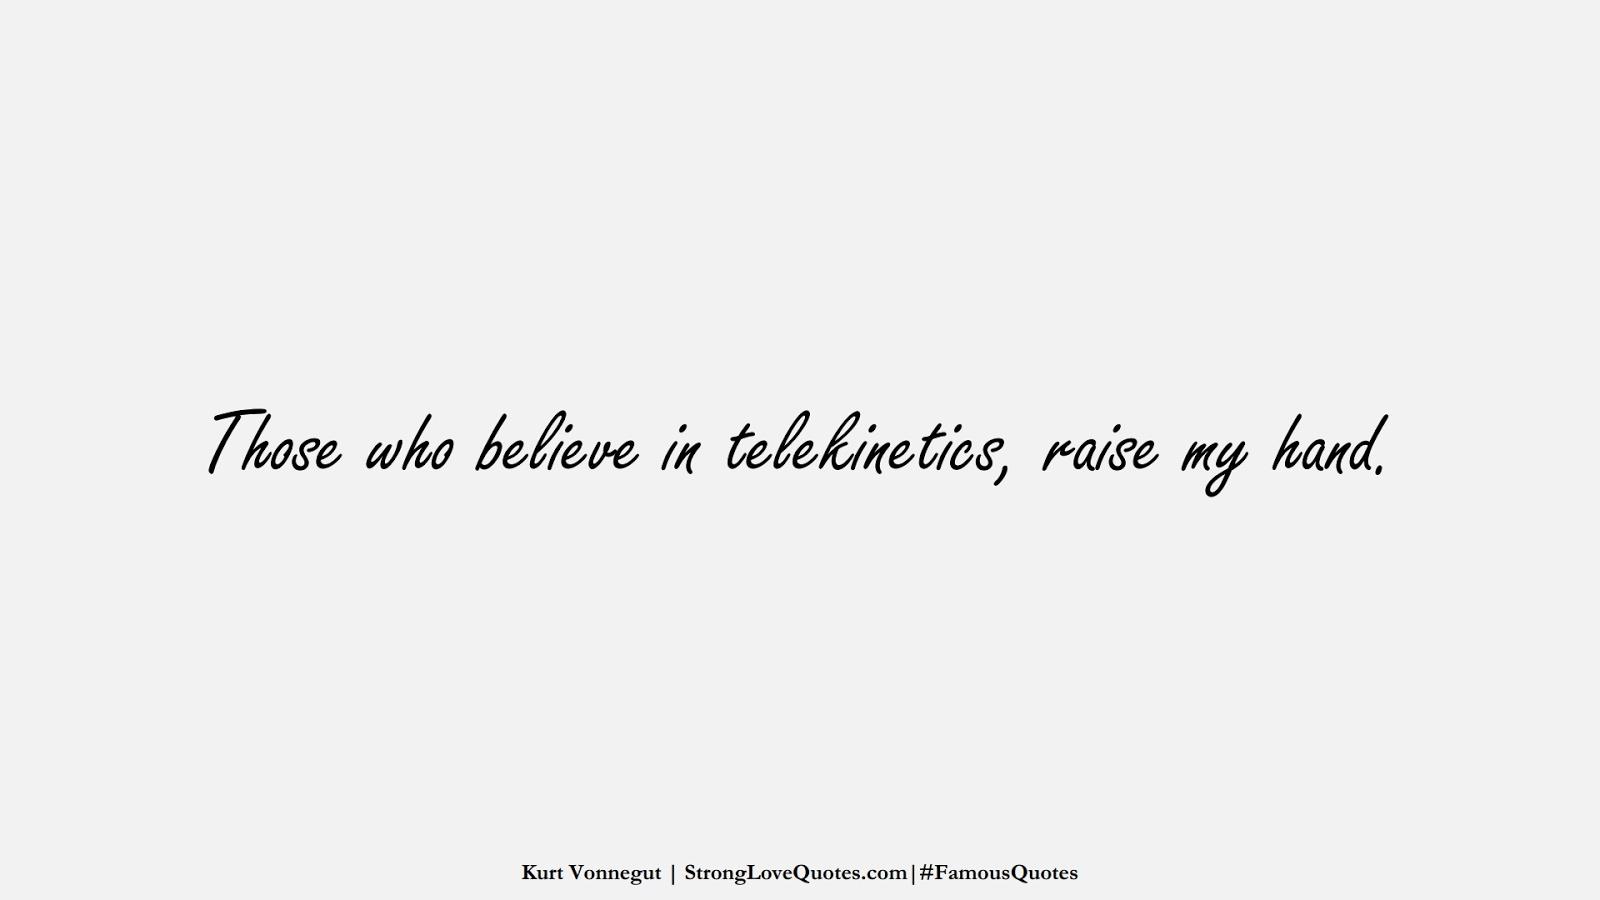 Those who believe in telekinetics, raise my hand. (Kurt Vonnegut);  #FamousQuotes